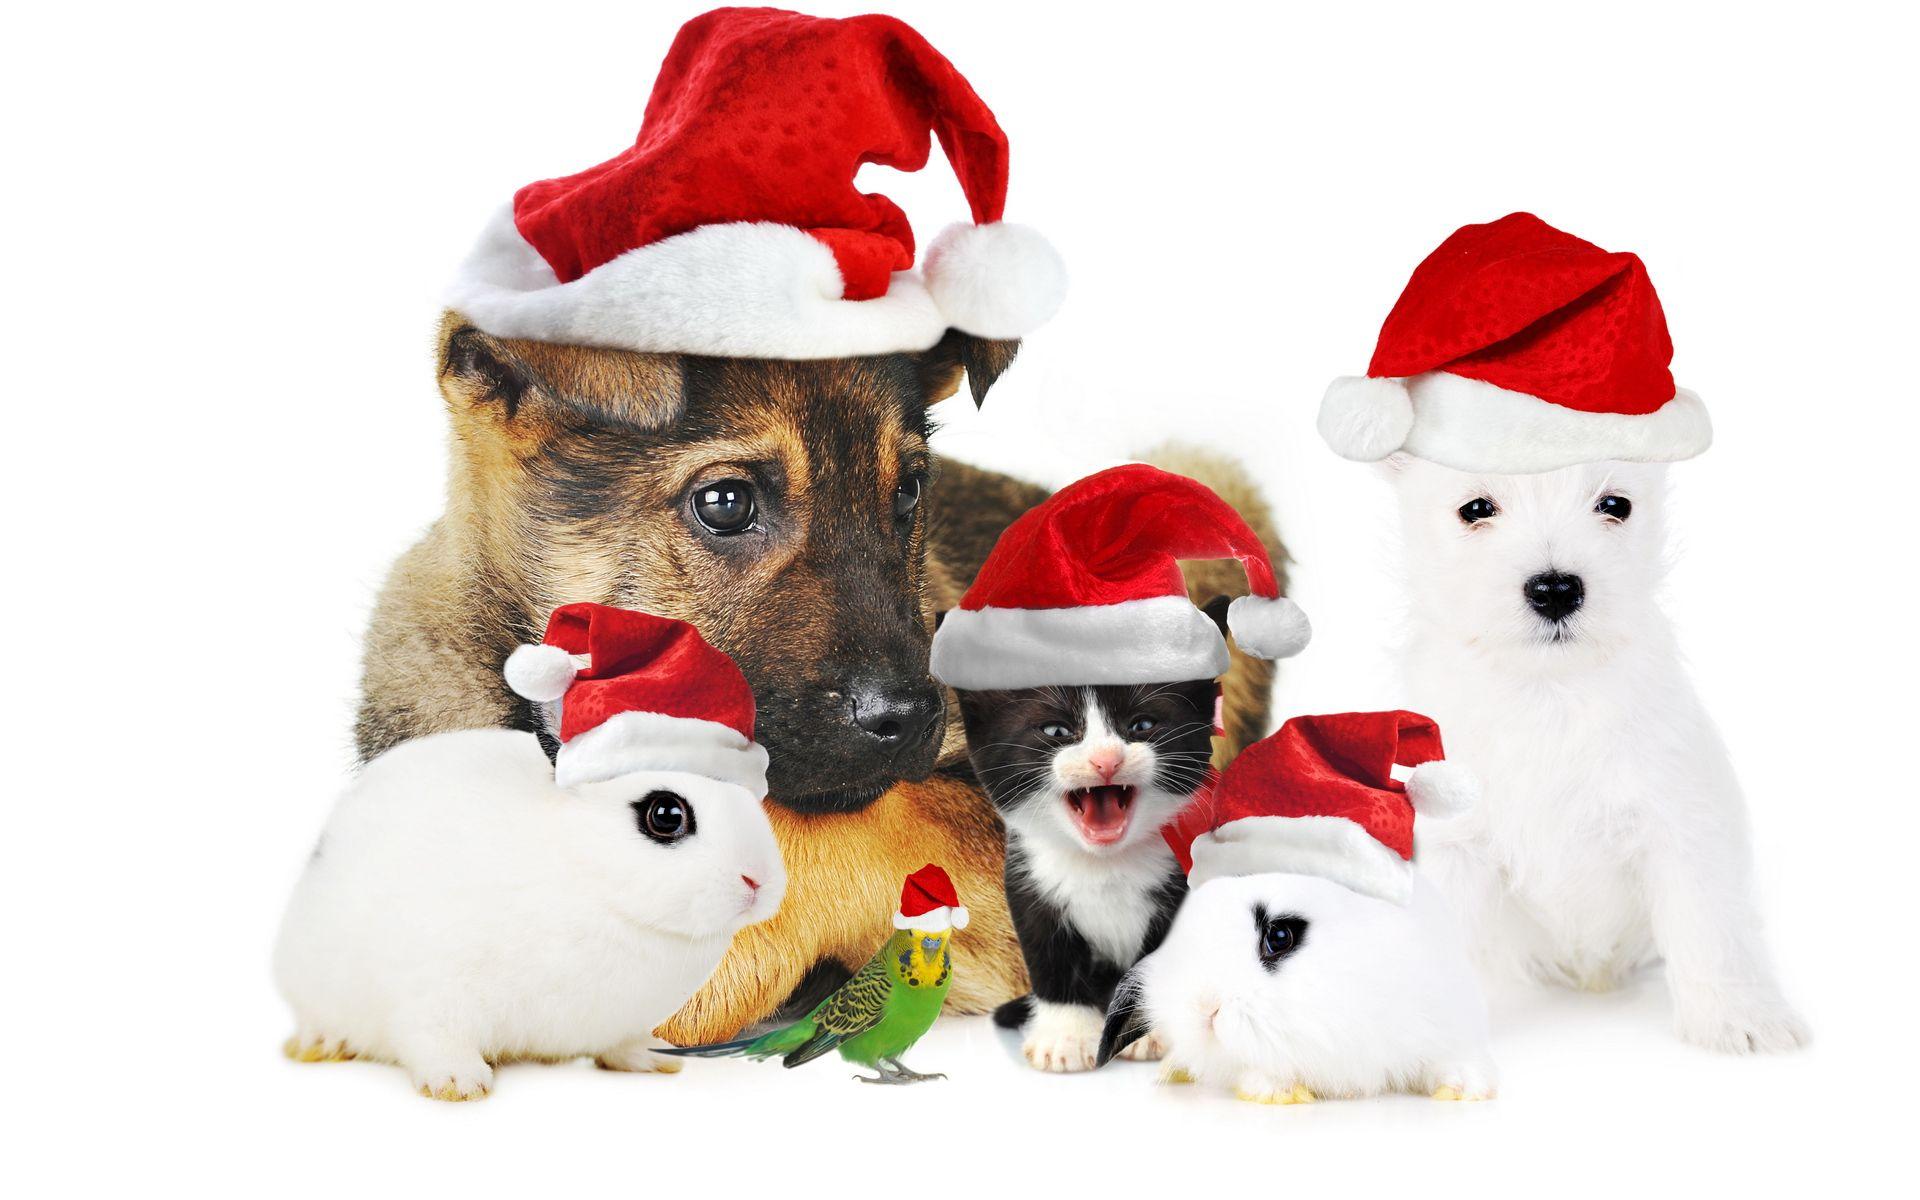 Christmas Computer Wallpaper Desktop Background 1920x1200 Id 323375 Pet Christmas Pictures Christmas Dog Christmas Animals